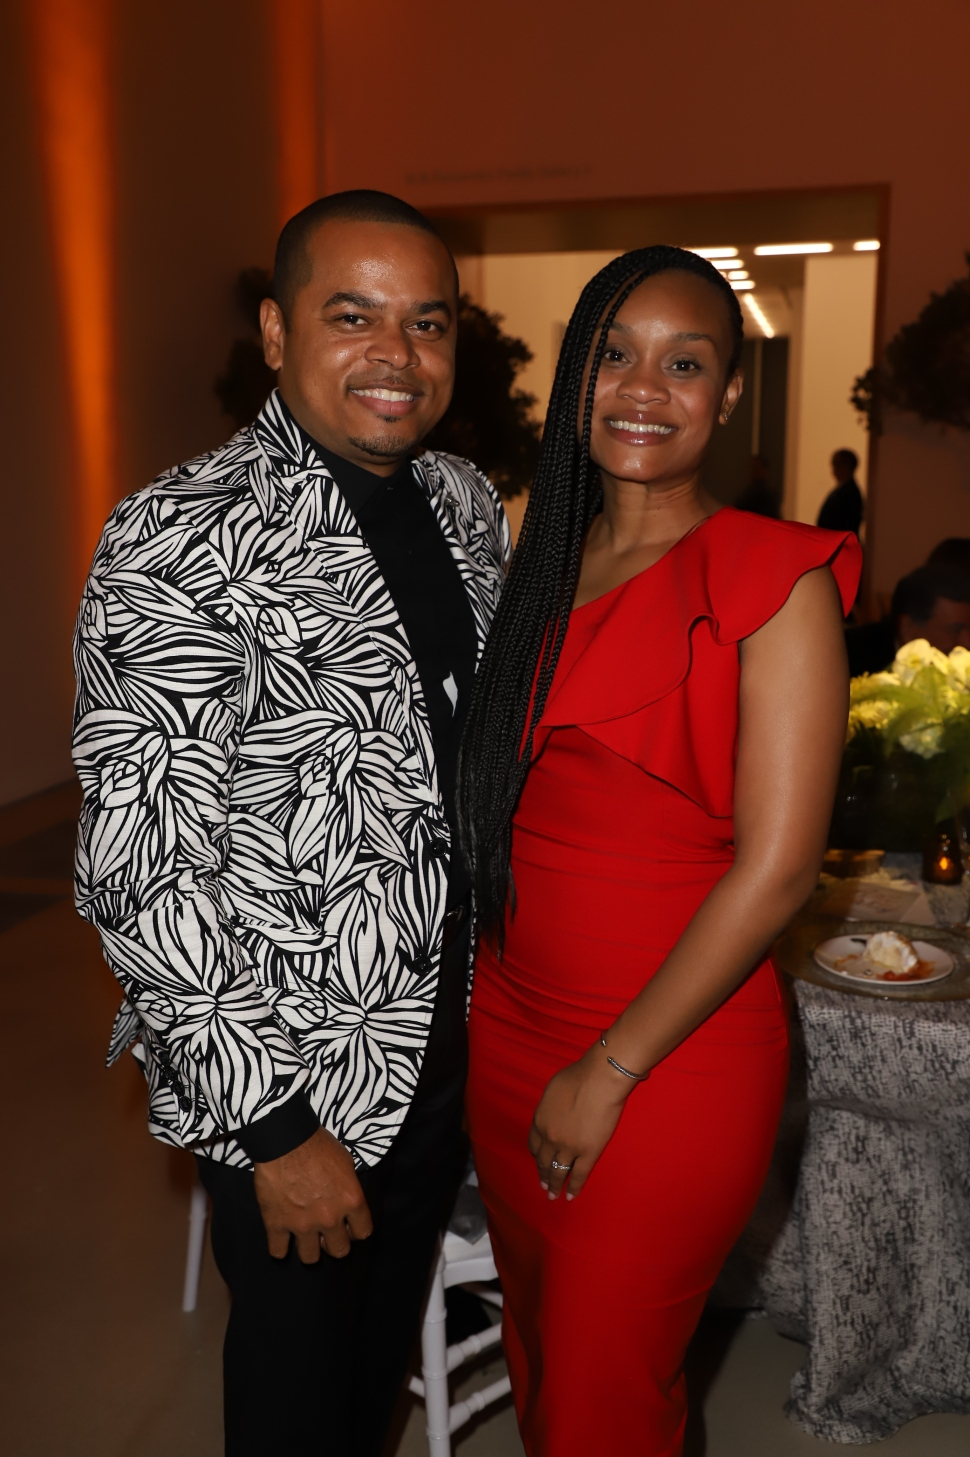 9. City of Miami Commissioner Keon Hardemon & Adria Hardemon